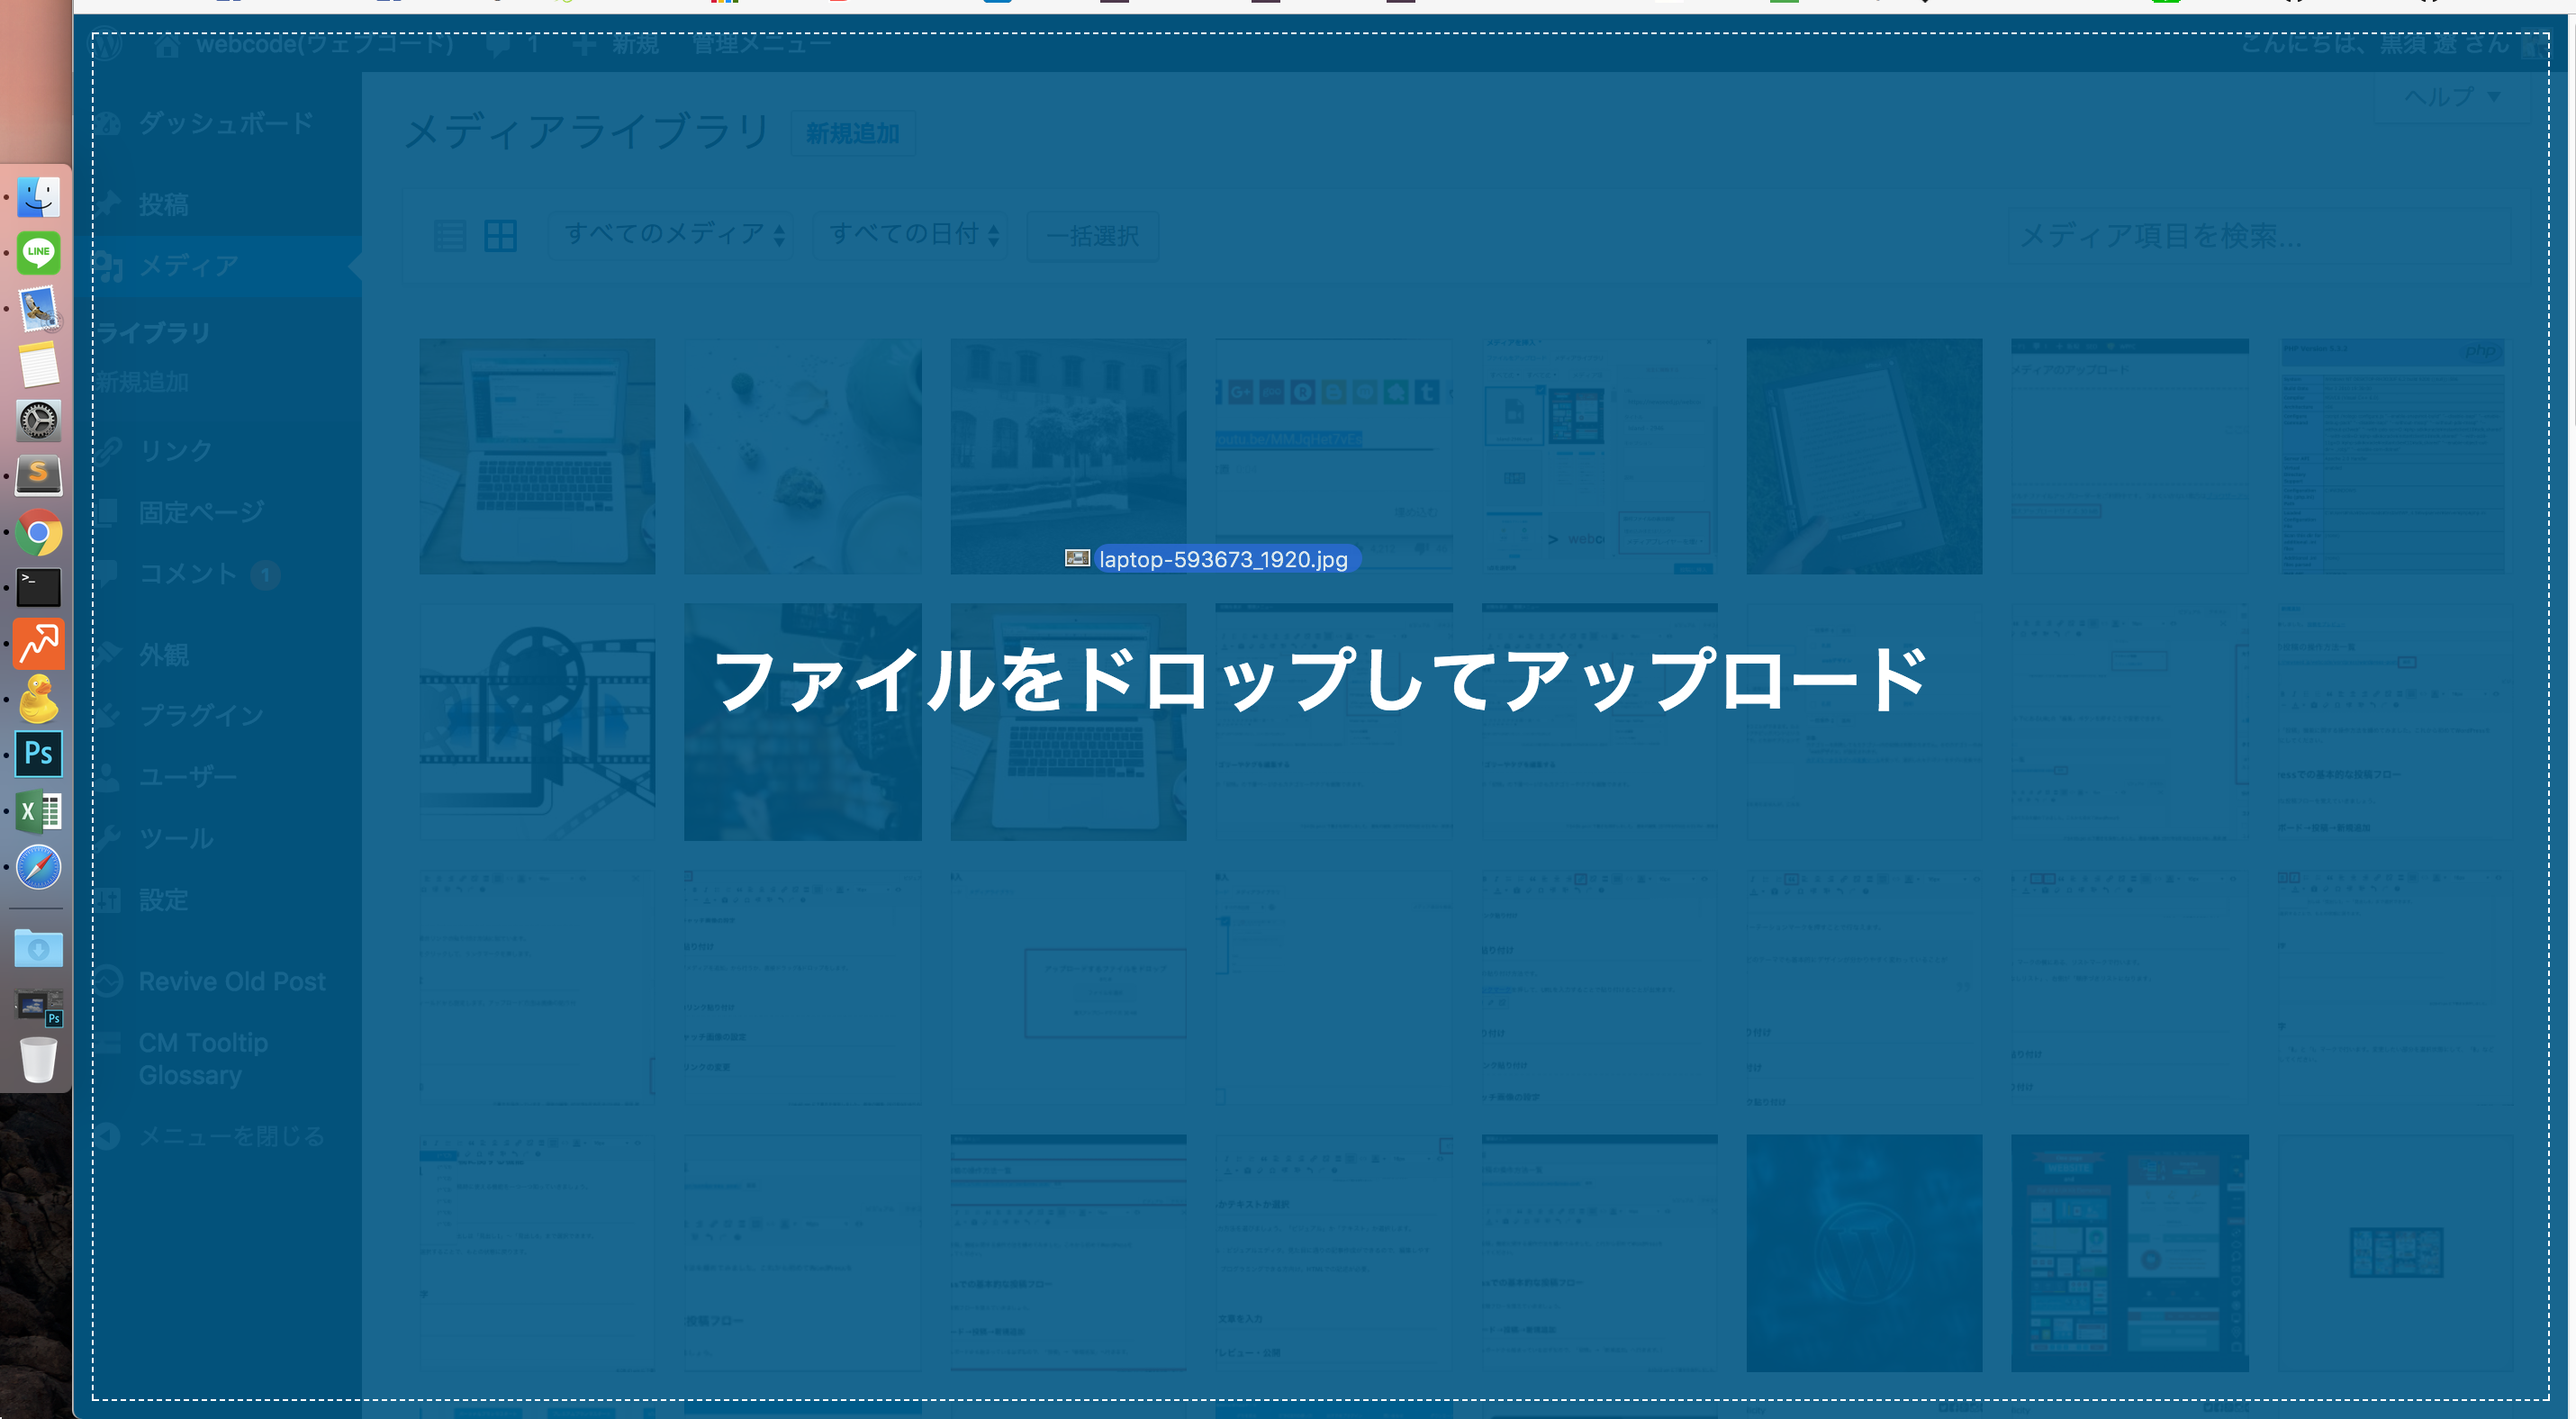 47365fe706480255caccd657c85e8f36 - WordPressの「メディア」に関する基本操作